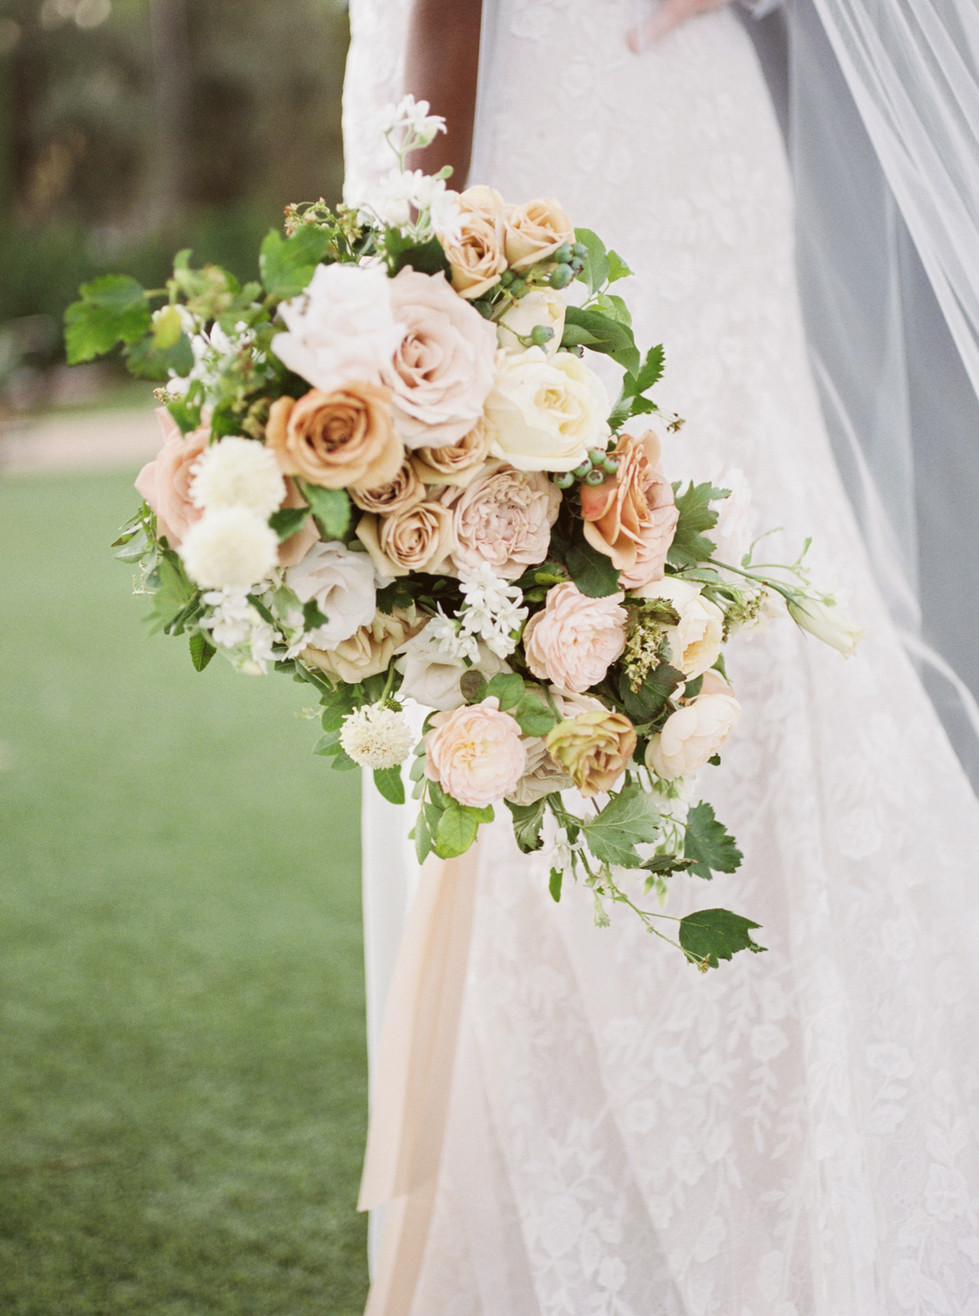 Honey, blush, and mustard bridal bouquet. Photo: Lianna Marie